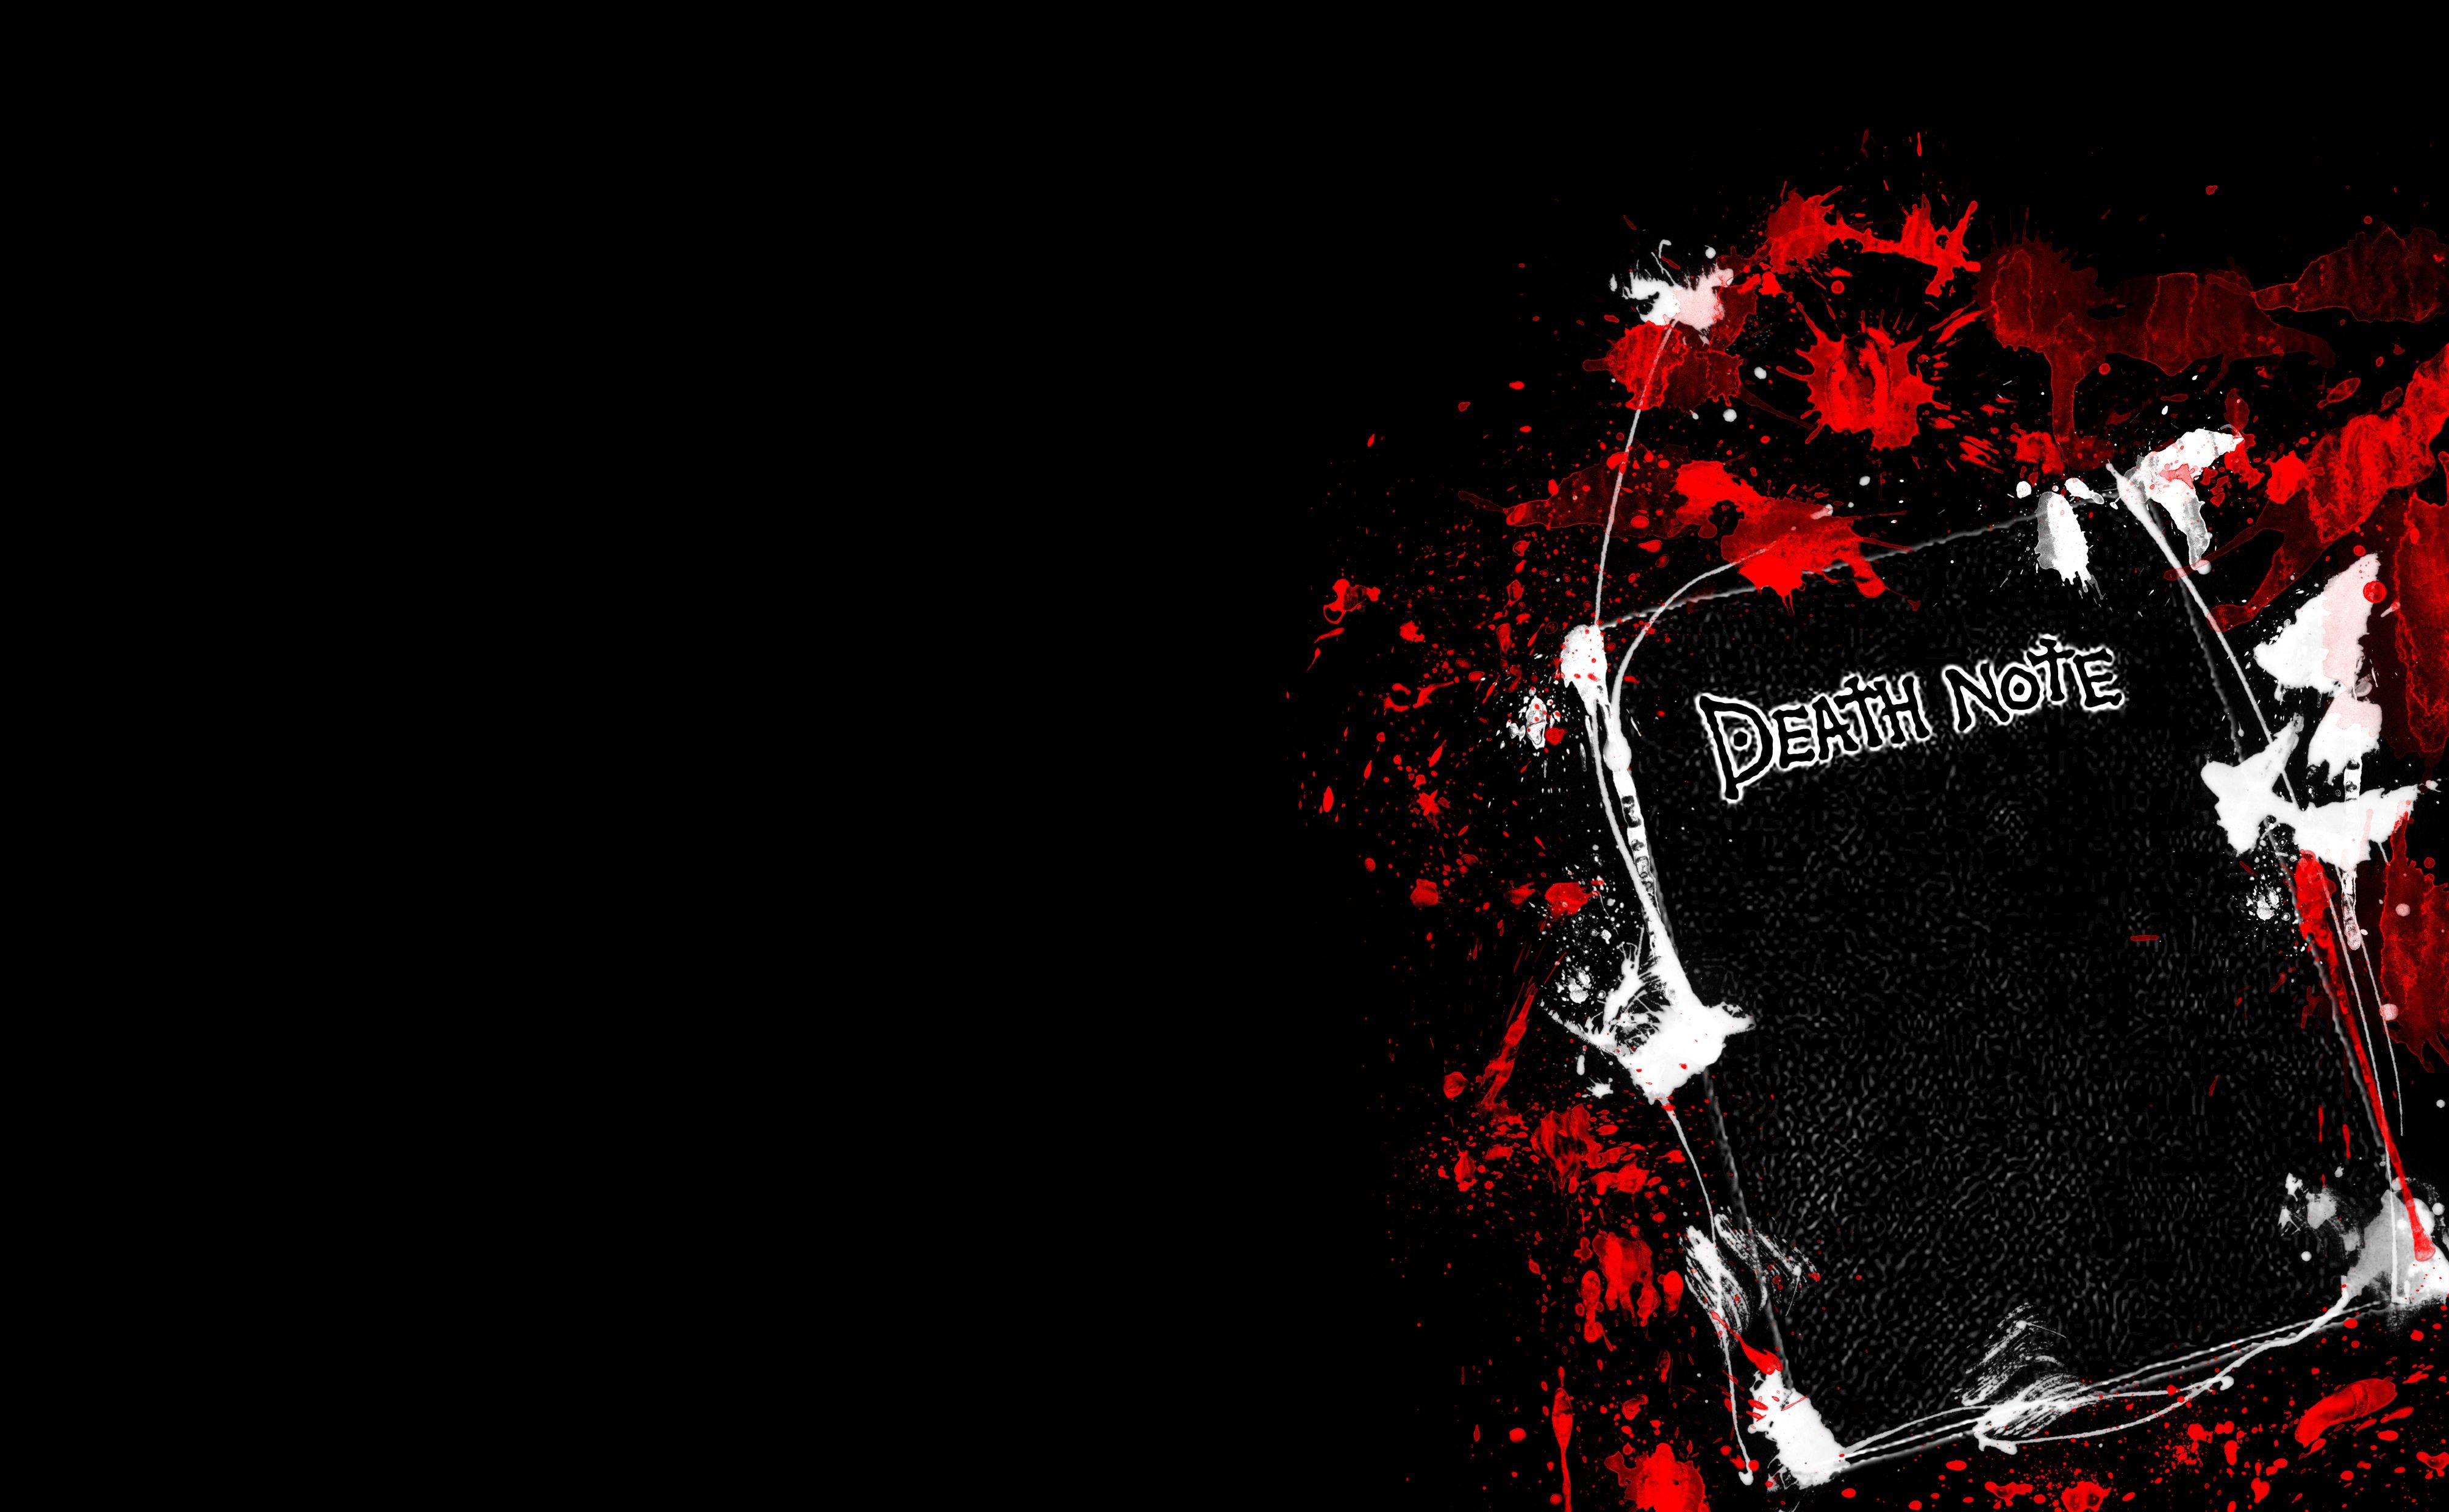 Anime Death Note Wallpaper Wallpaper Death Note 61 Wallpapers Hd Wallpapers